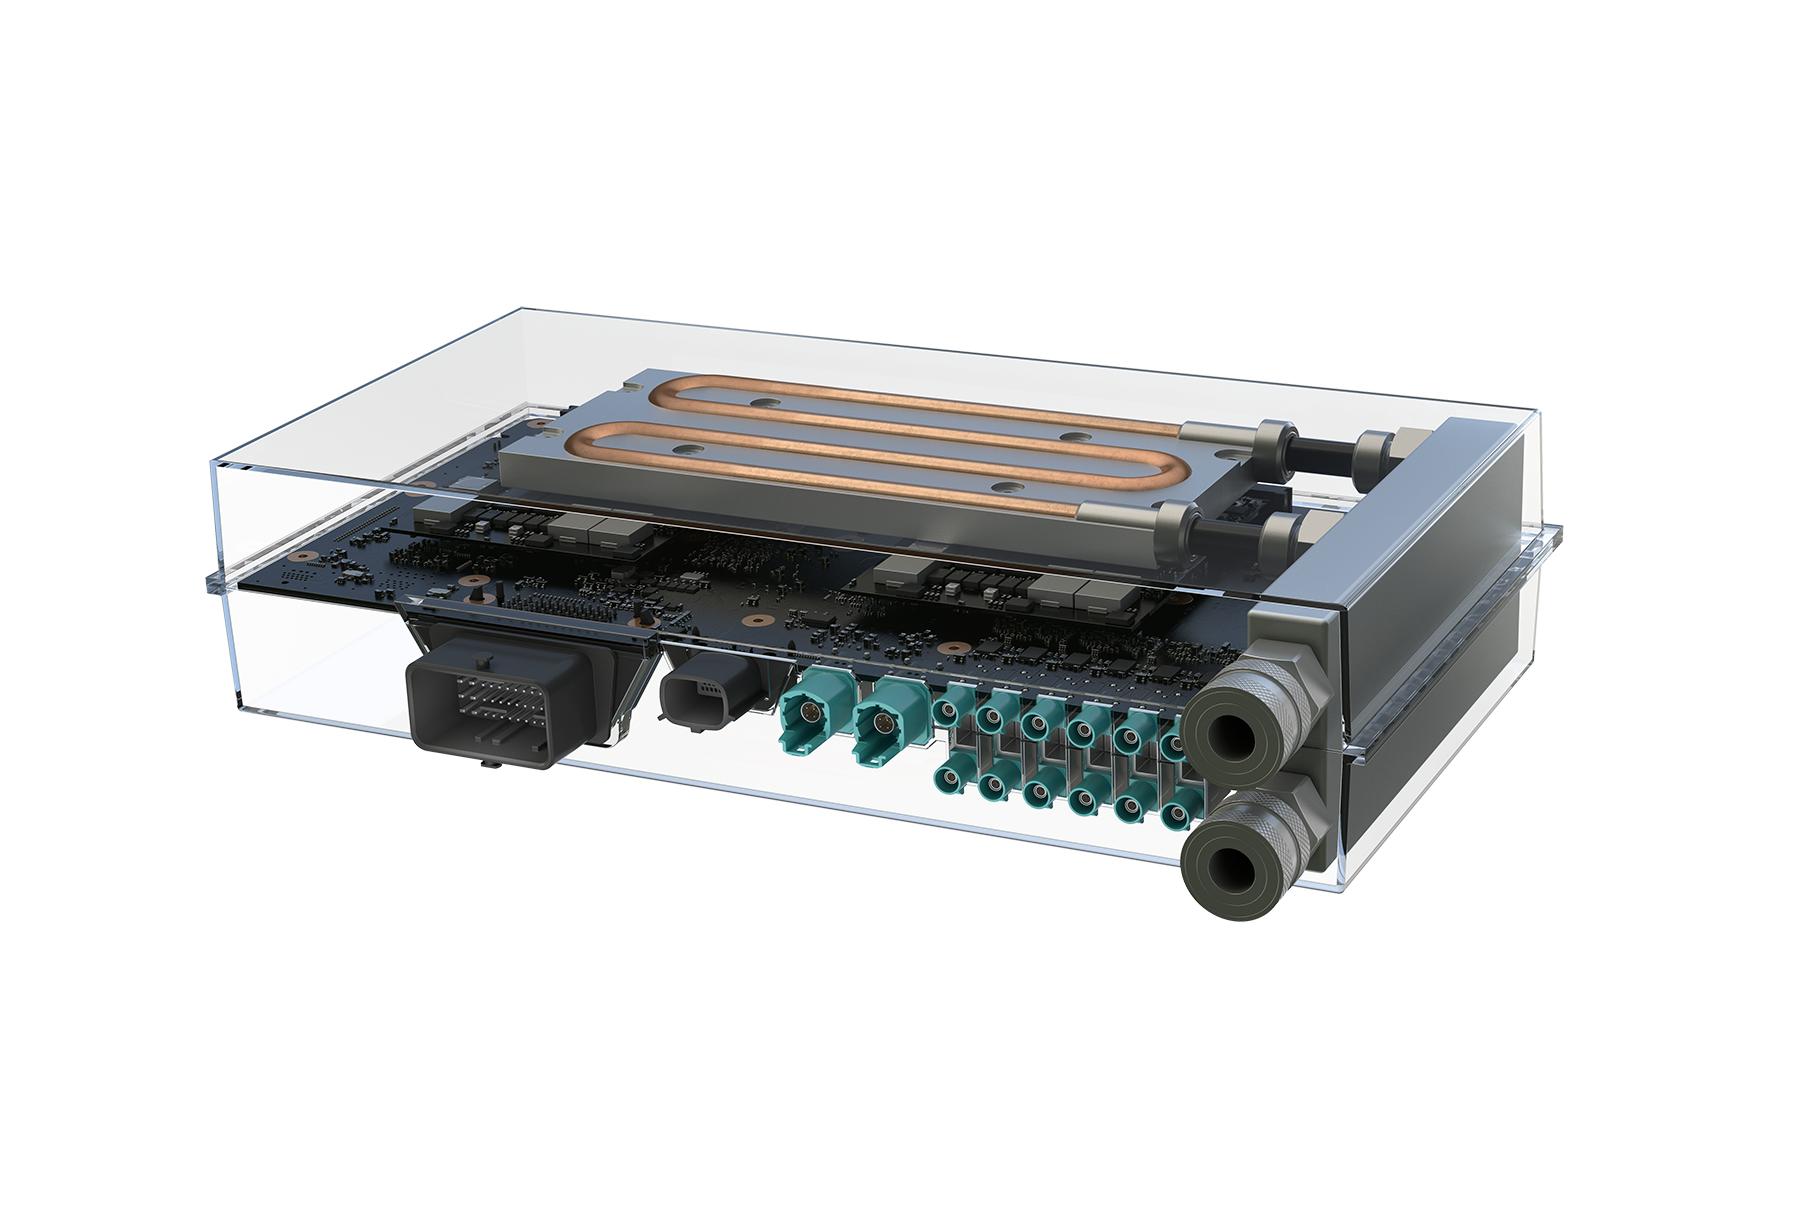 NVIDIA's Drive PX automotive computer.